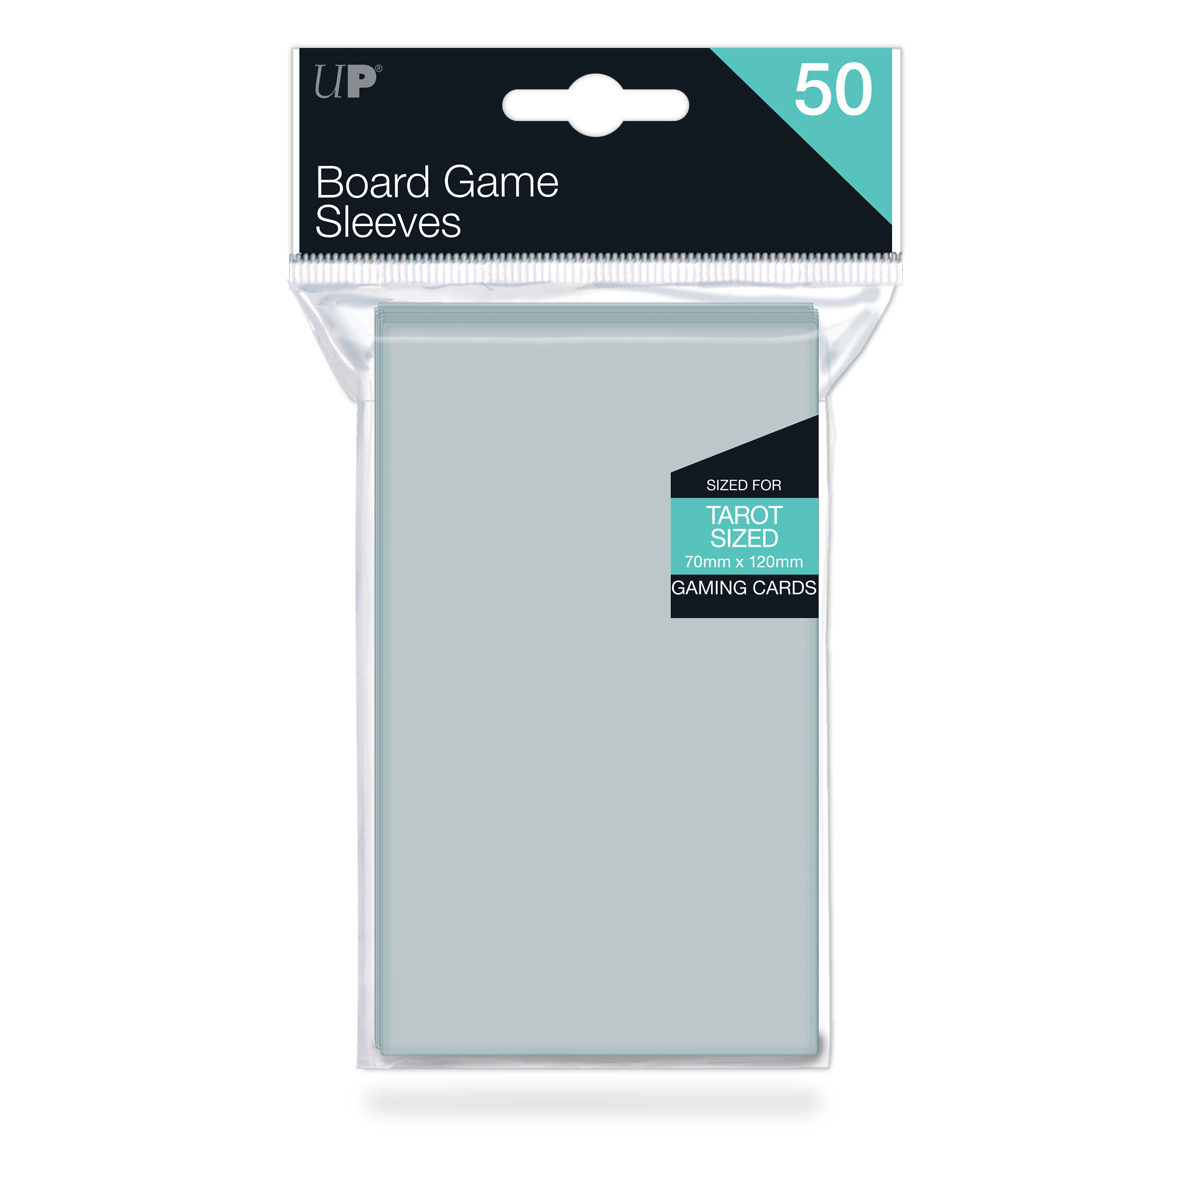 Board Game Sleeves 70x120mm Tarot Card Game Kartenhüllen Clear *NEU /& OVP* 100